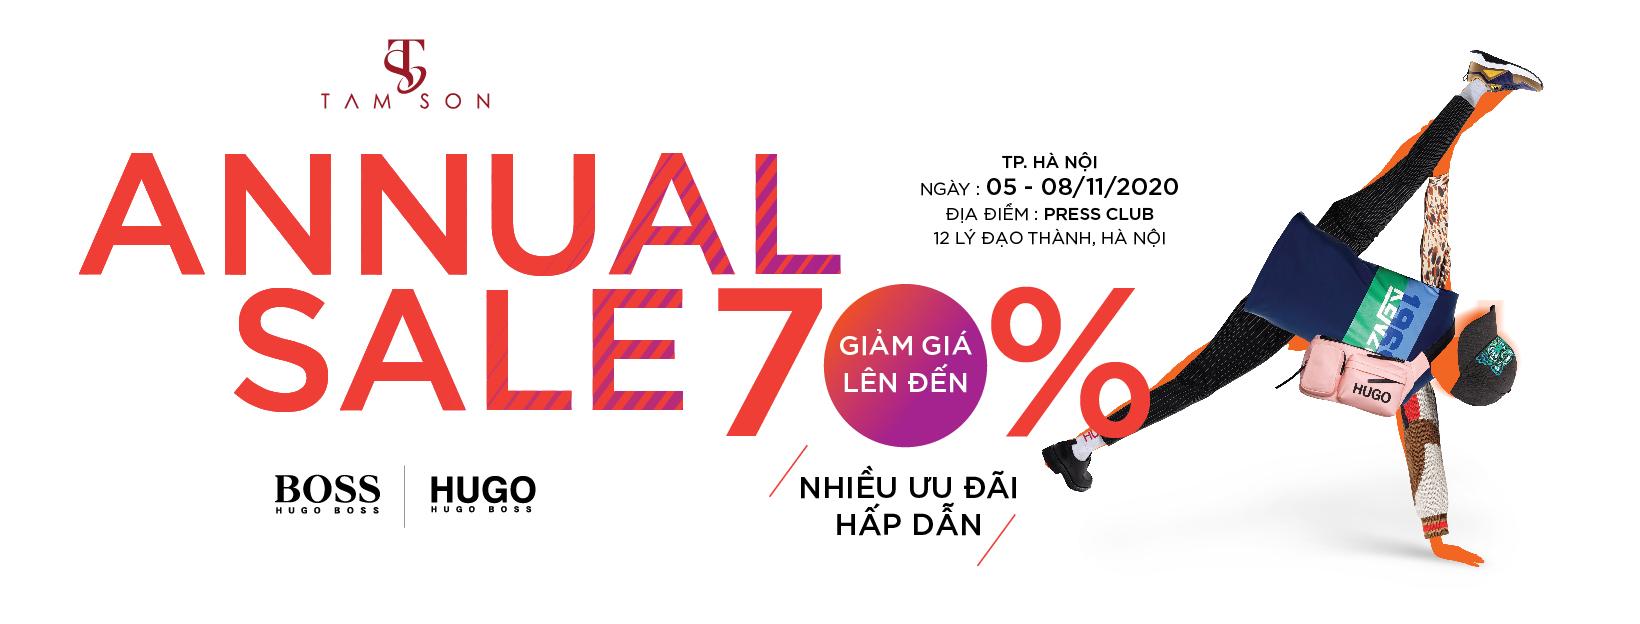 Annual sale 1